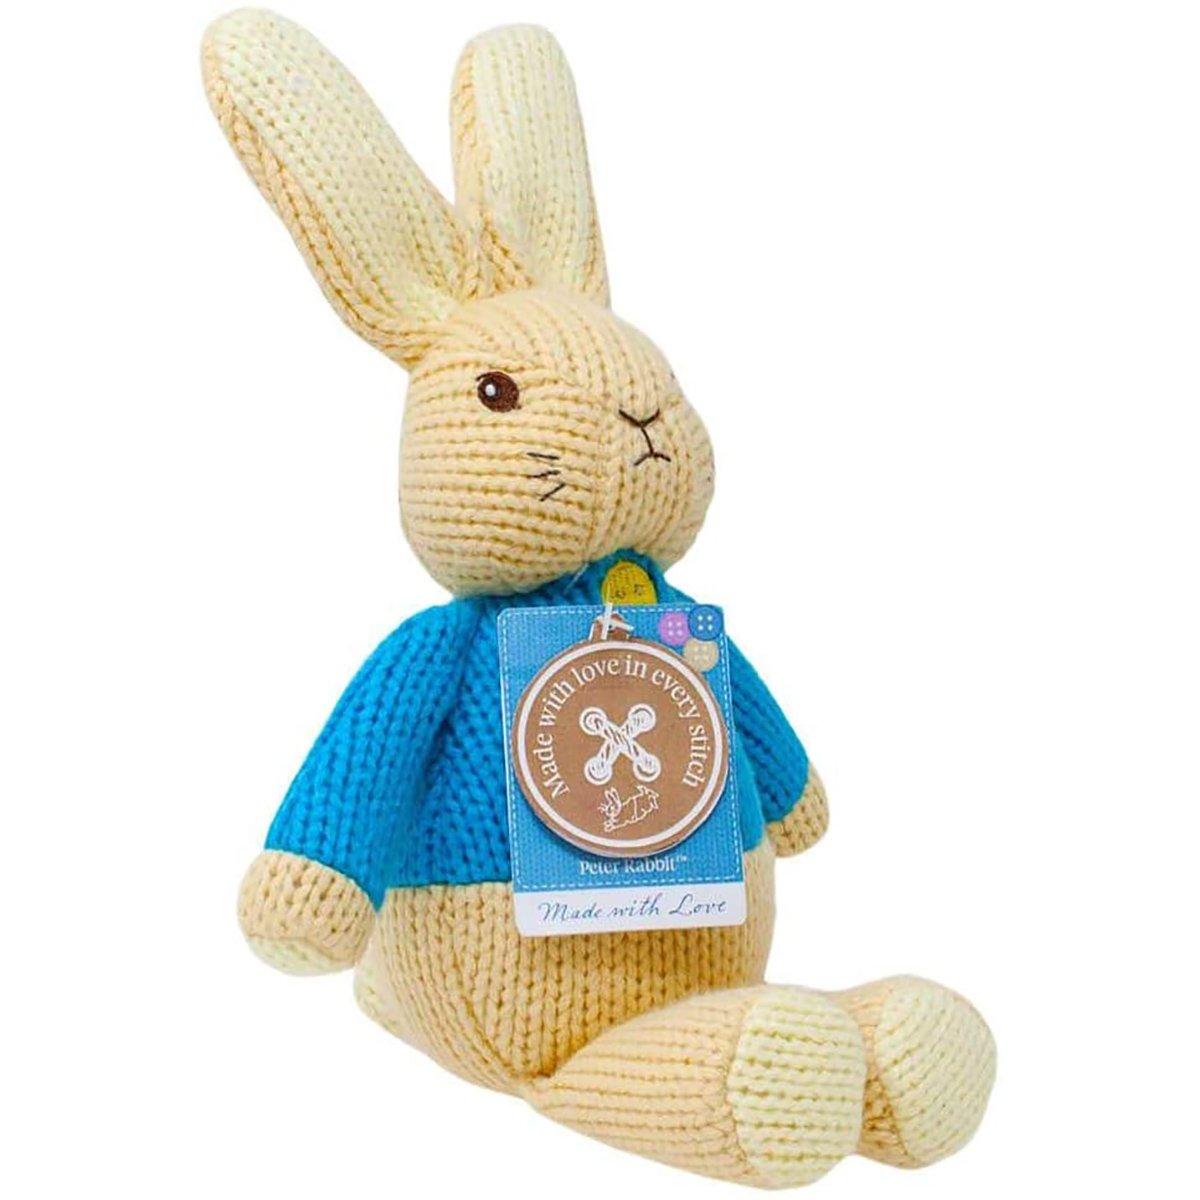 Jucarie Bebelusi Peter Rabbit, Made With Love, 30 Cm